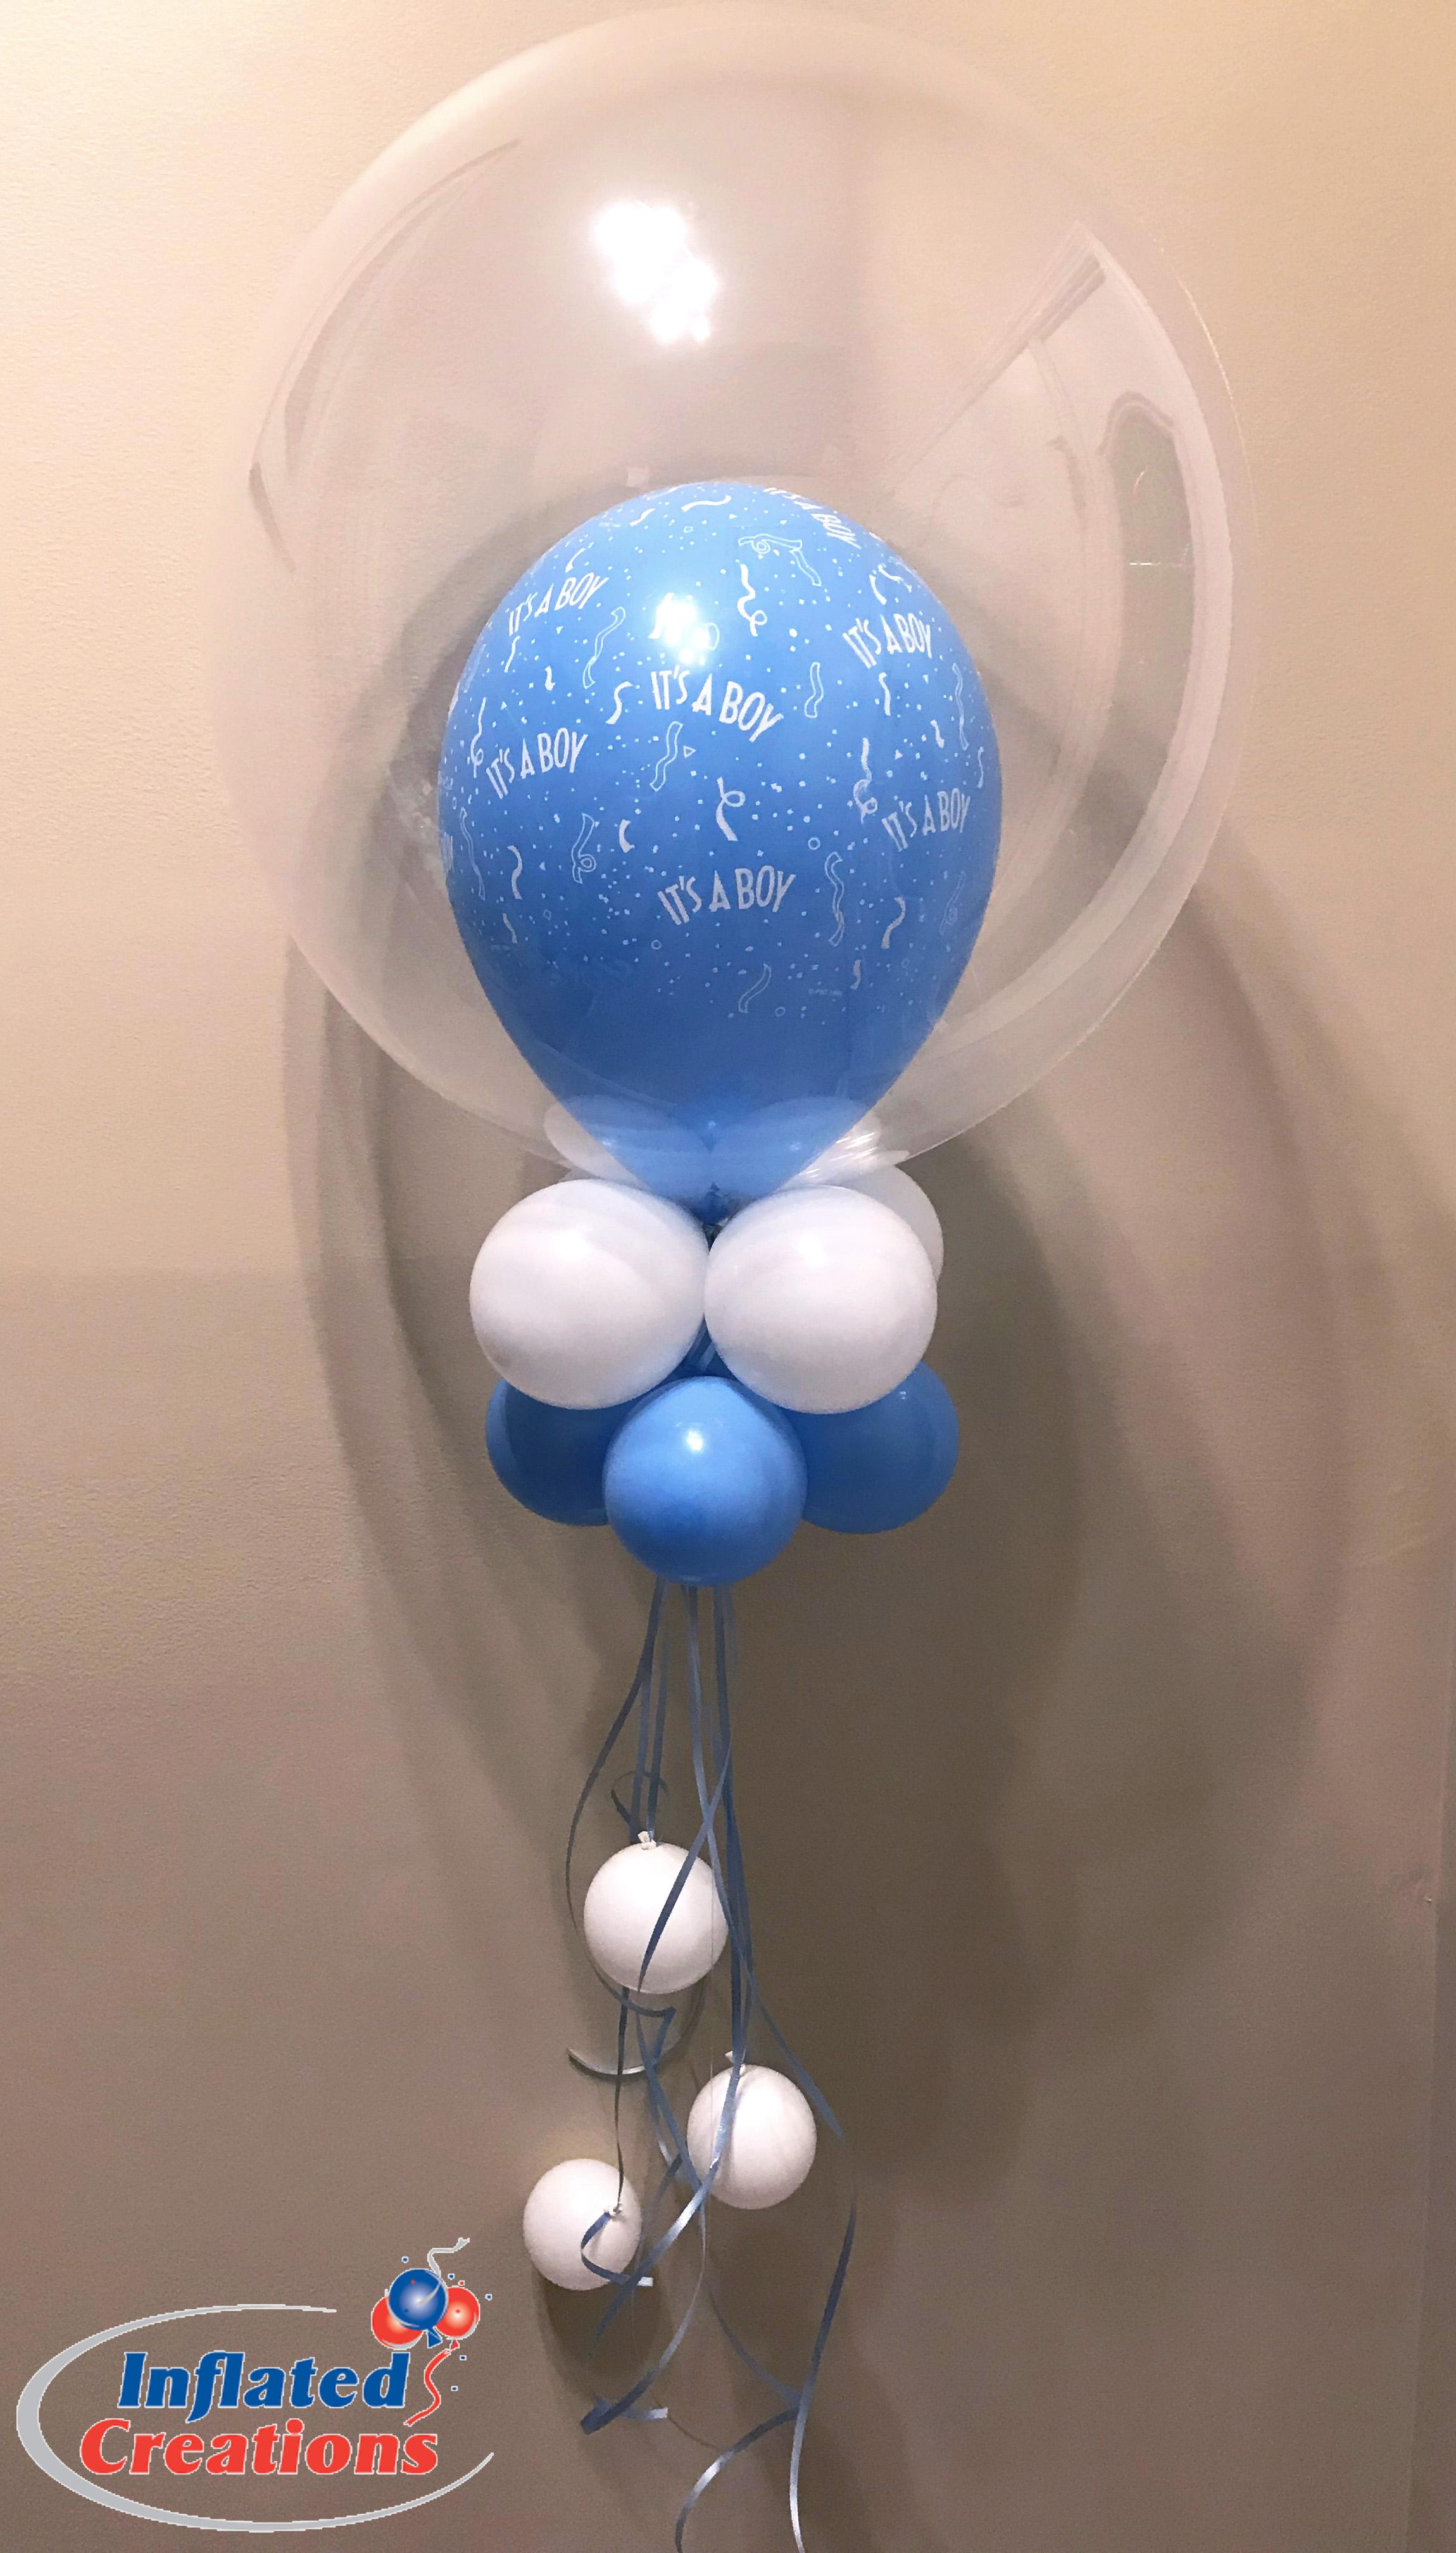 Double Balloon It's a Boy!